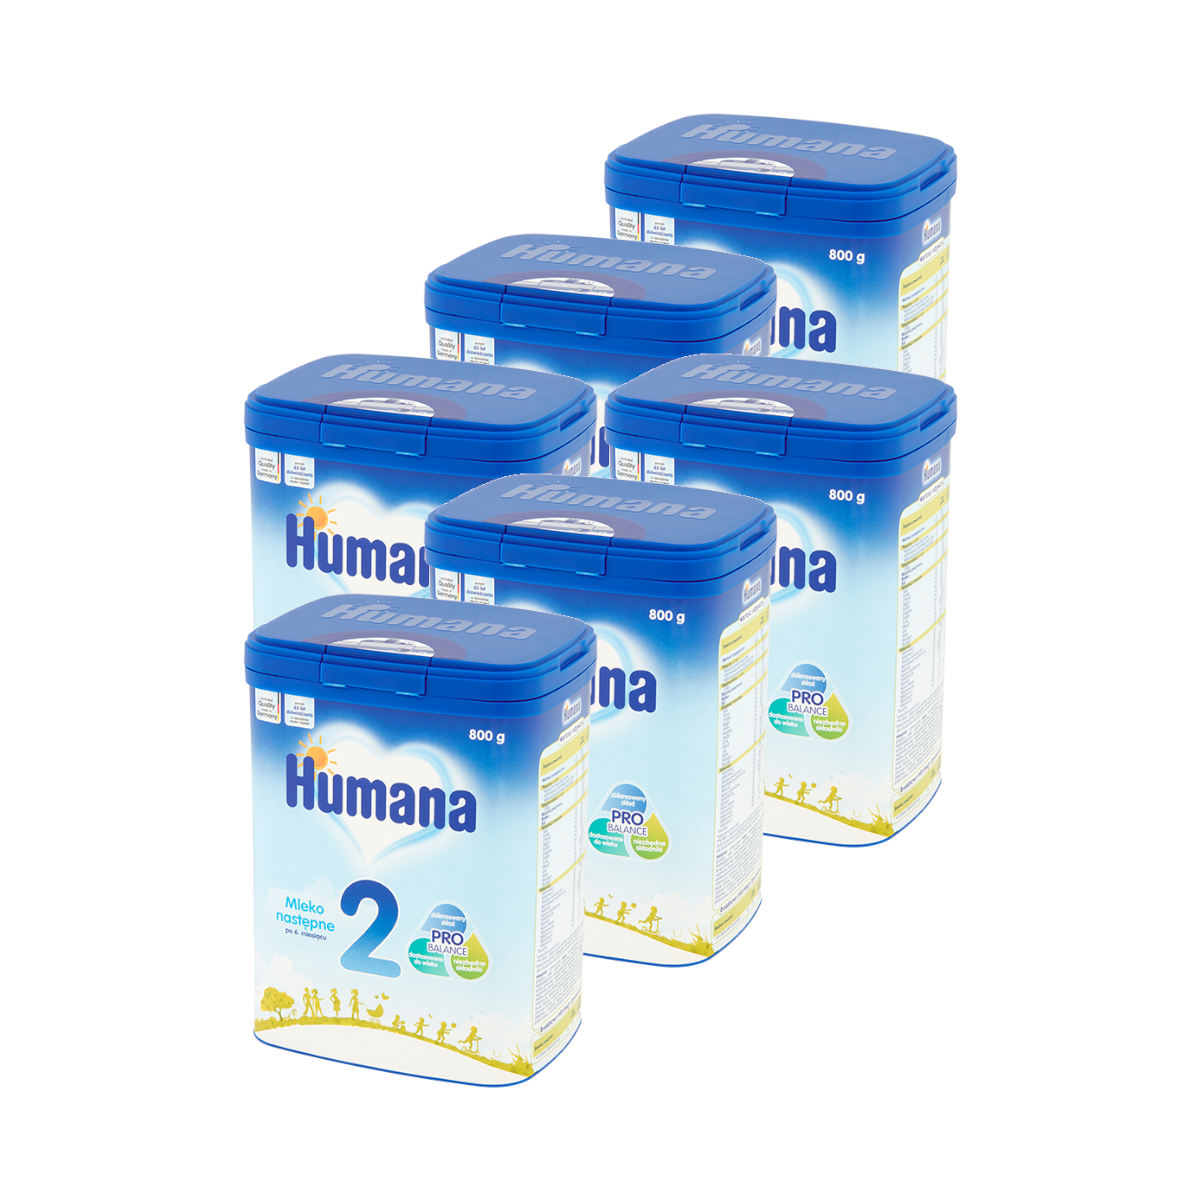 humana2_800_6pak